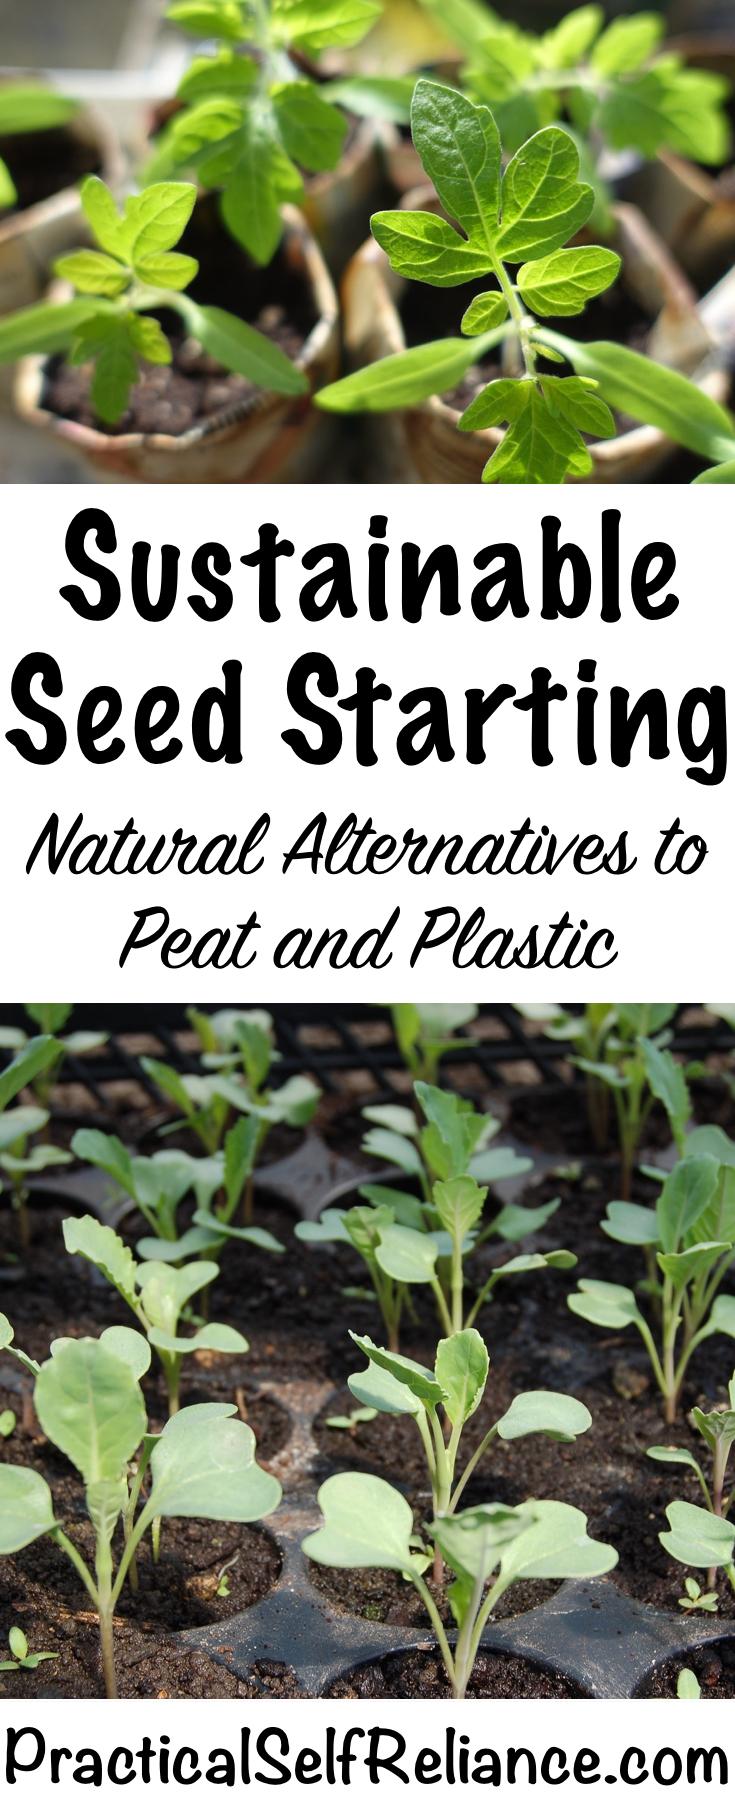 Sustainable Seed Starting Alternatives to Peat and Plastic #seedstarting #heirloom #grownfromseed #gardening #organicgardening #foodgardening #howtogrow #vegetablegardening #gardeningtips #homesteading #homestead #selfreliant #sustainability